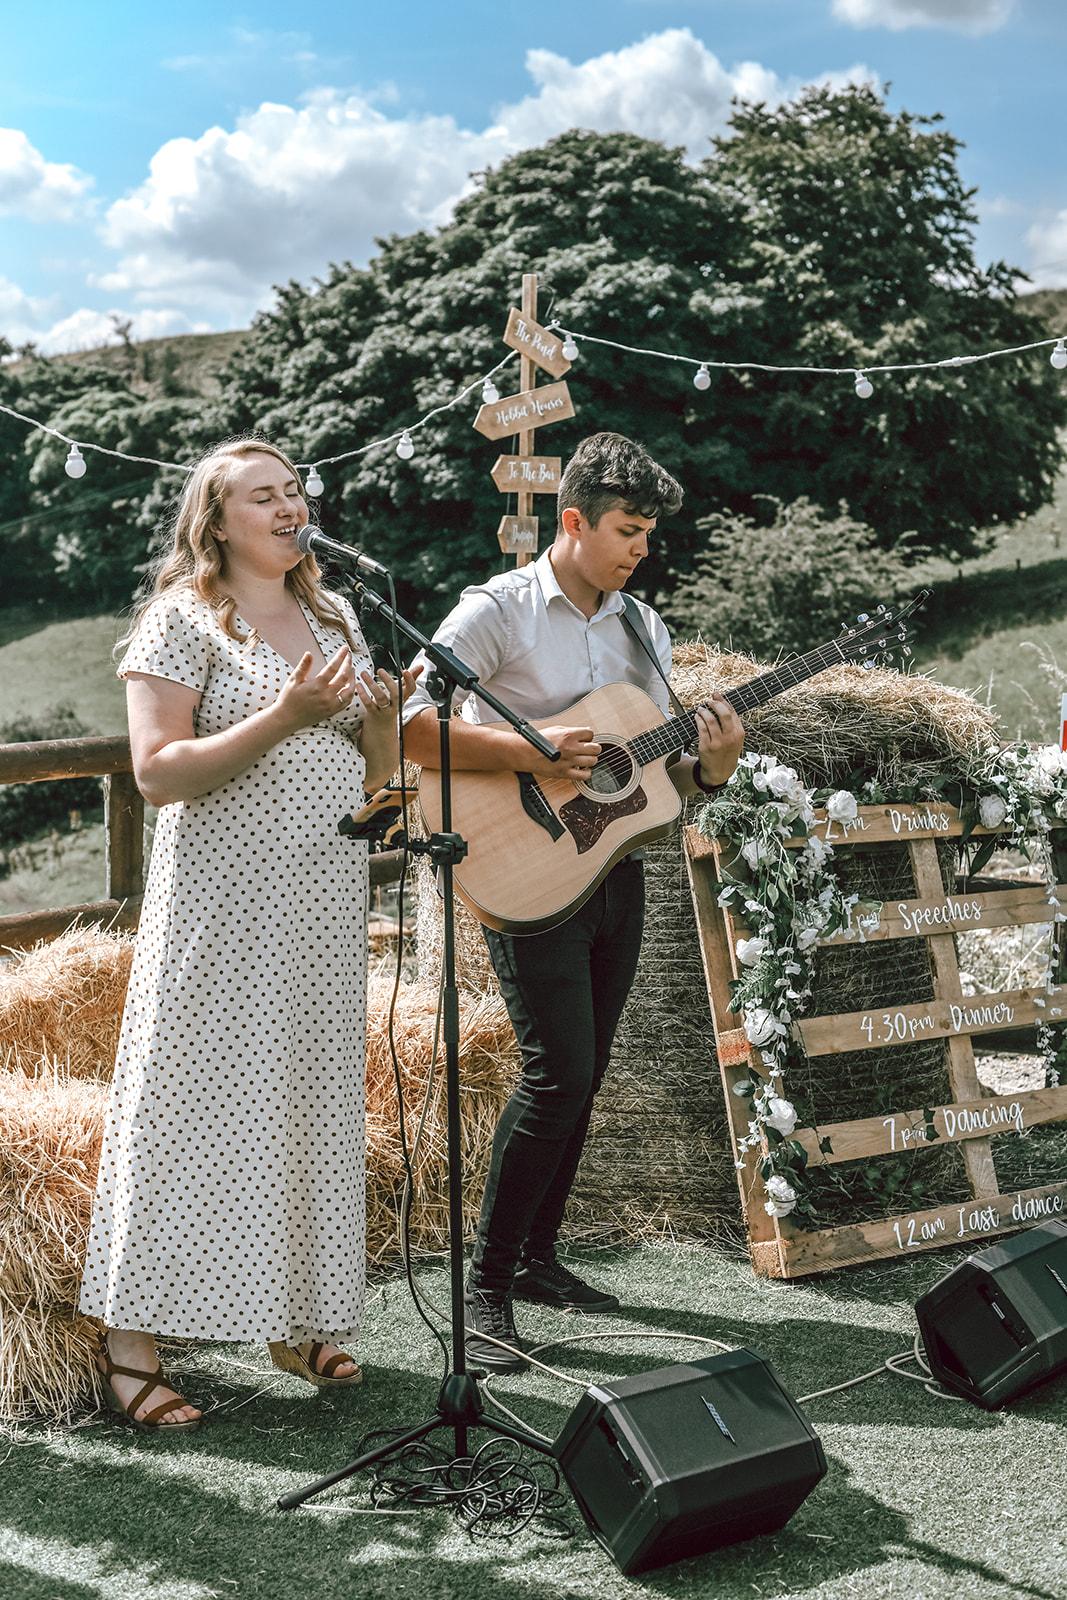 rustic festival wedding - unique wedding entertainment - wedding duo - acoustic duo for weddings - festival wedding entertainment